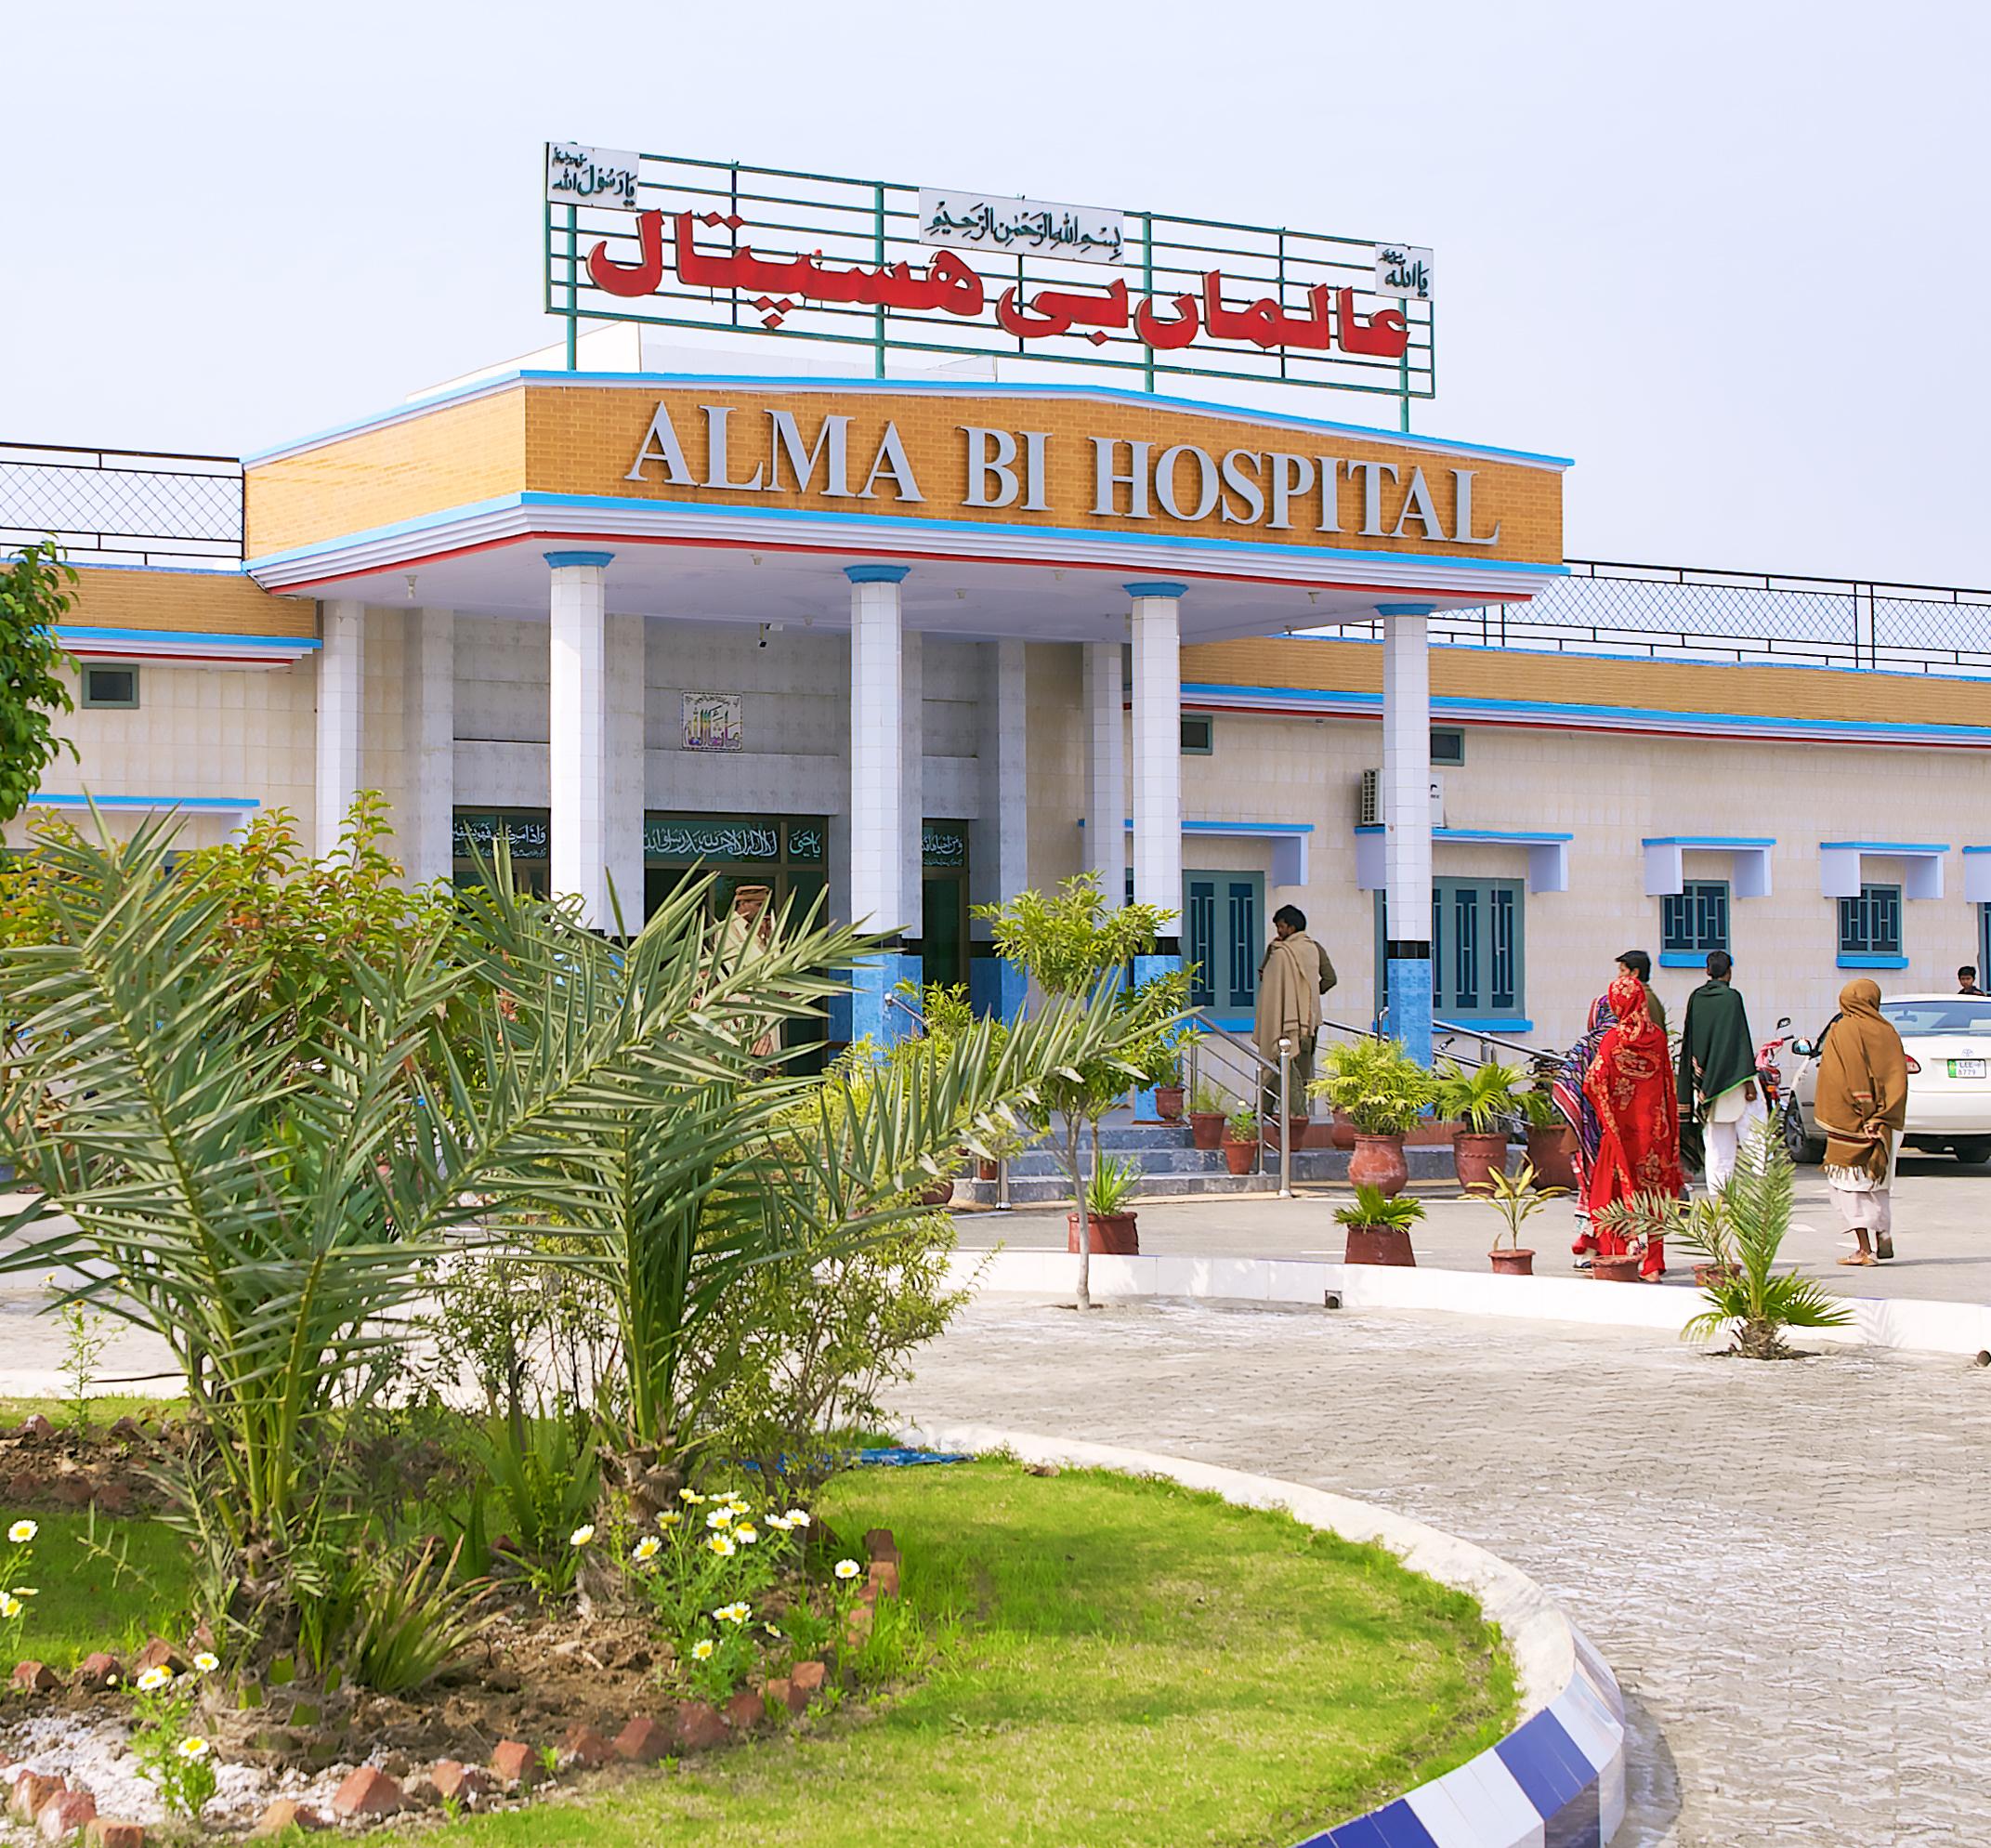 Hospital Front Image